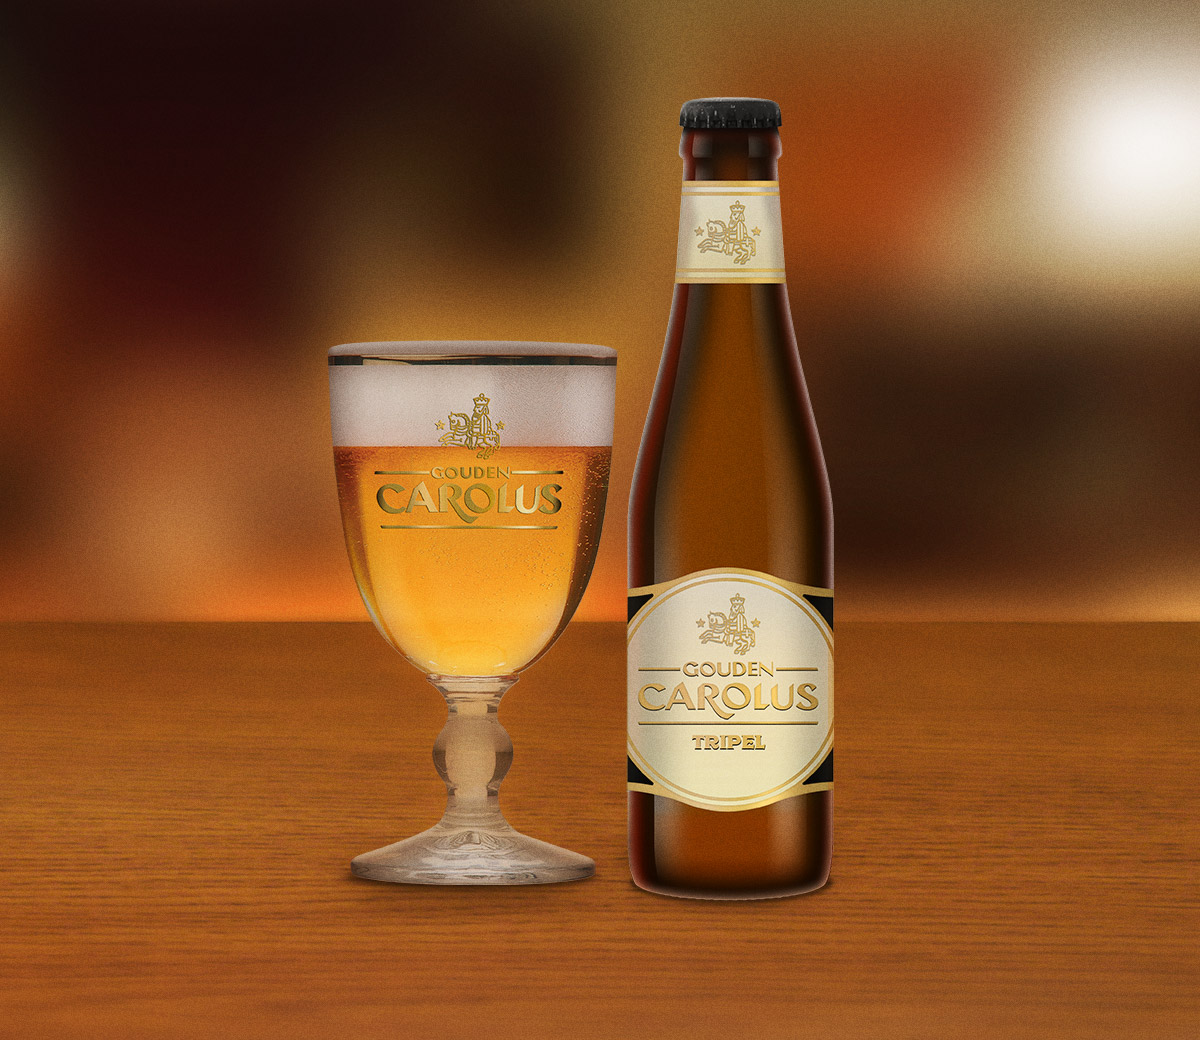 Gouden Carolus Tripel met glas